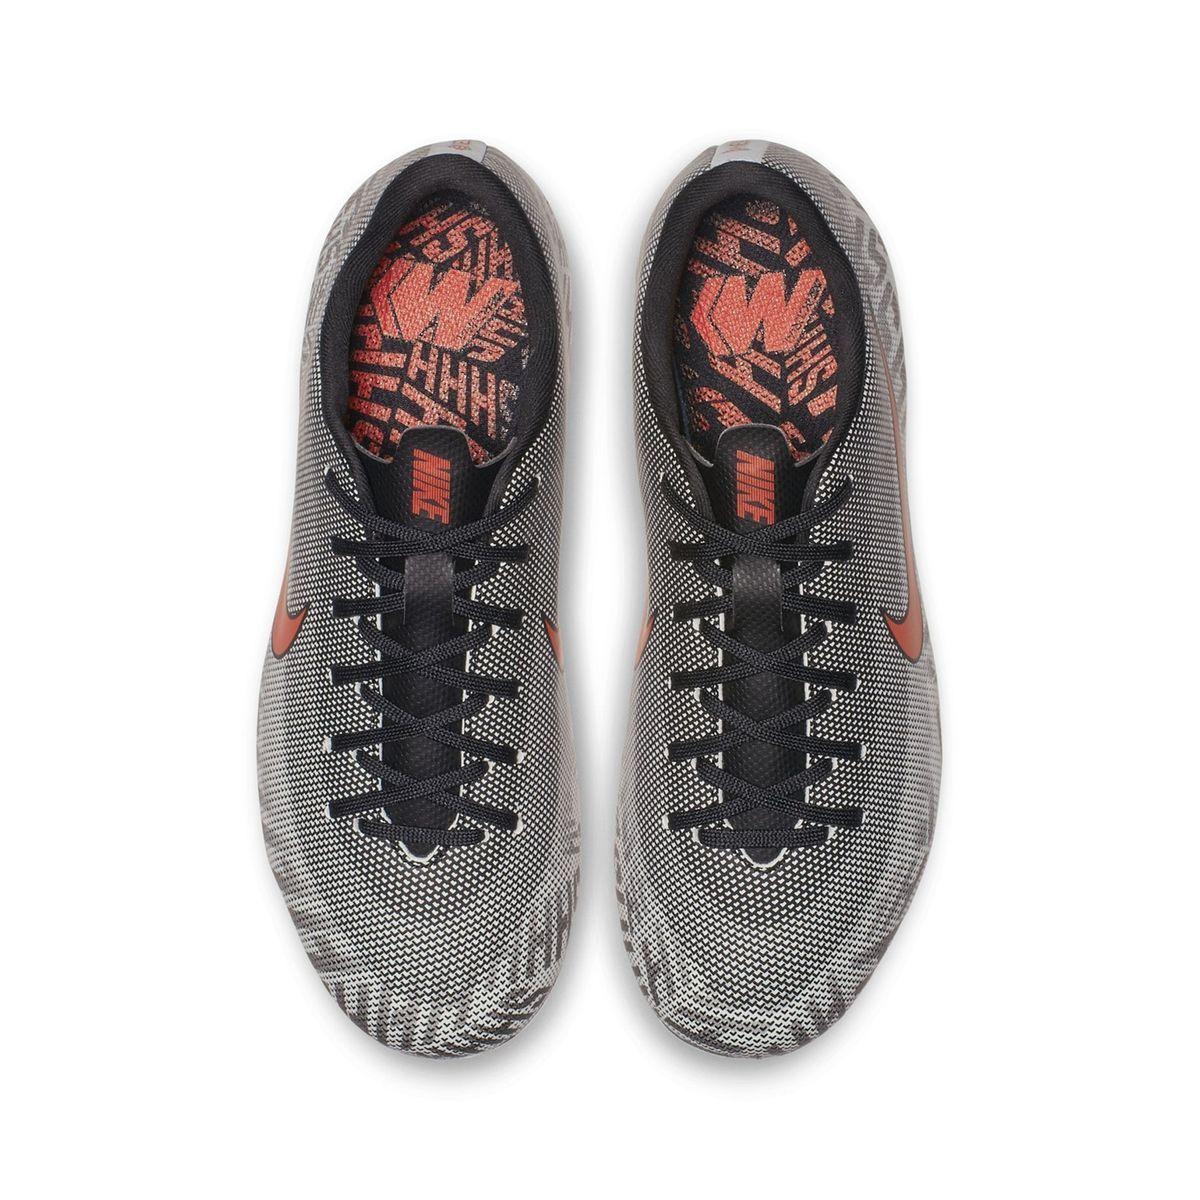 Chaussures Football Nike Mercurial Vapor Xii Silencio